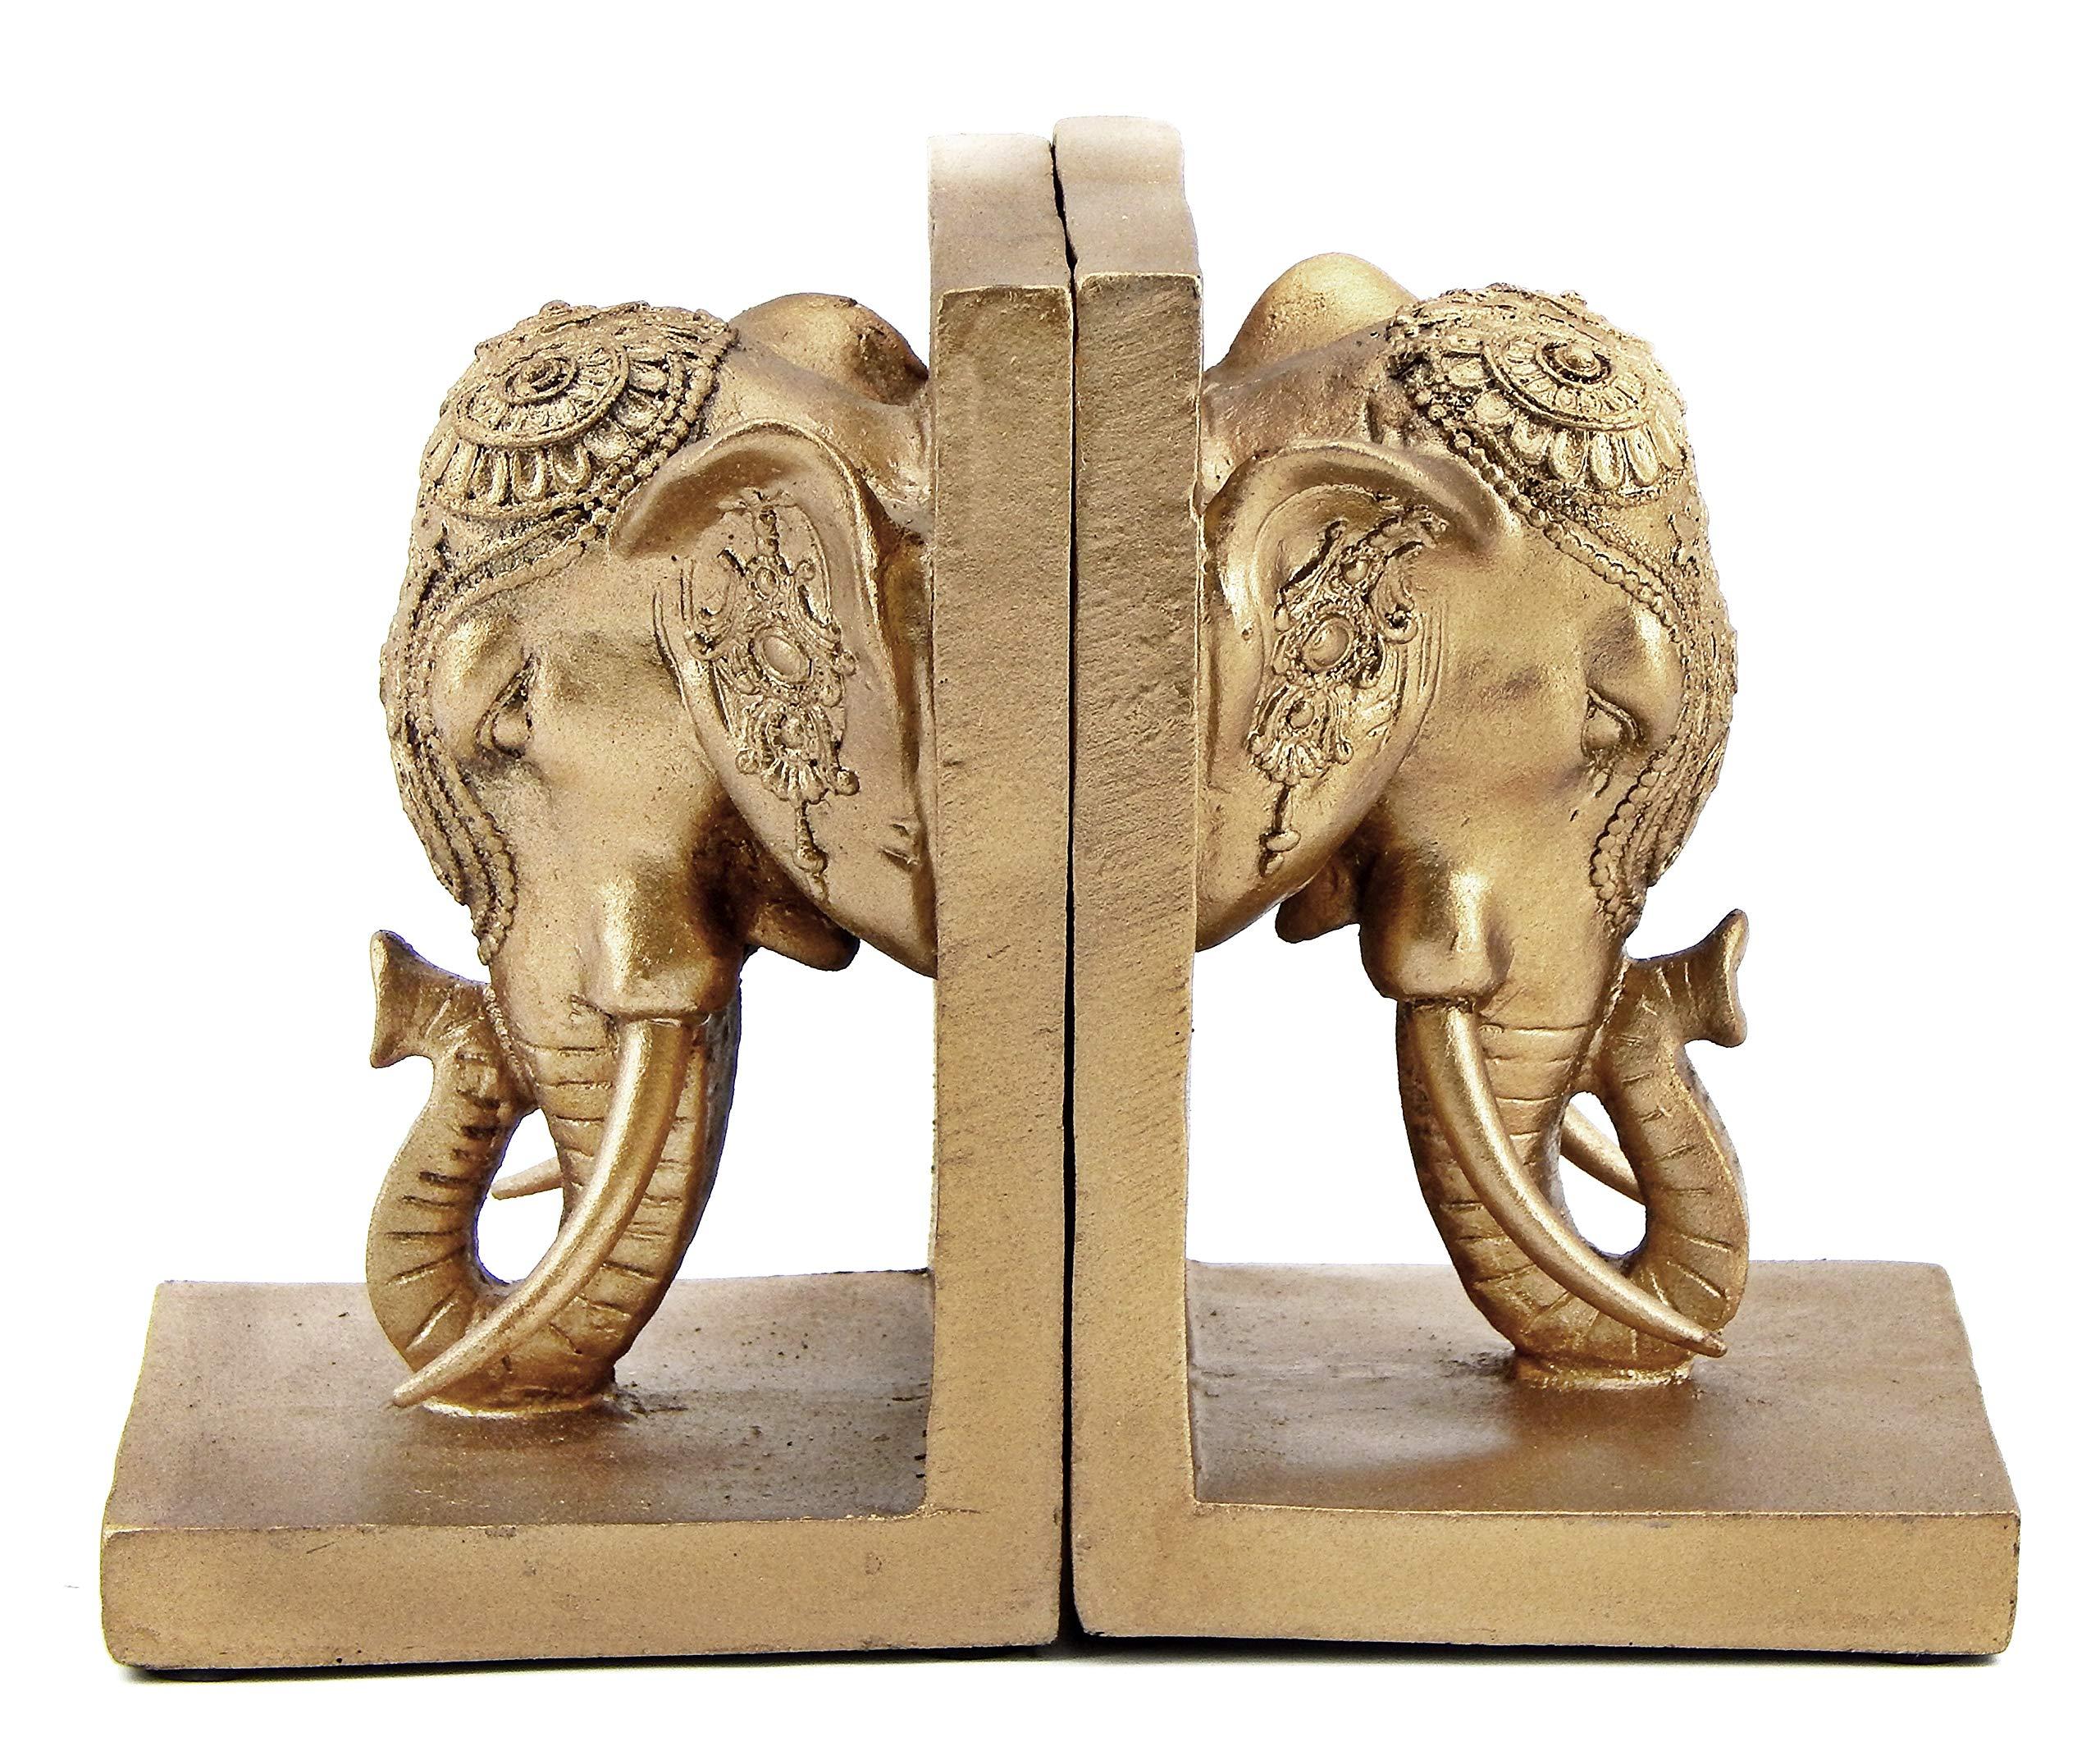 Bellaa 21817 Bookends Elephant Head Bookshelf Decor 7''